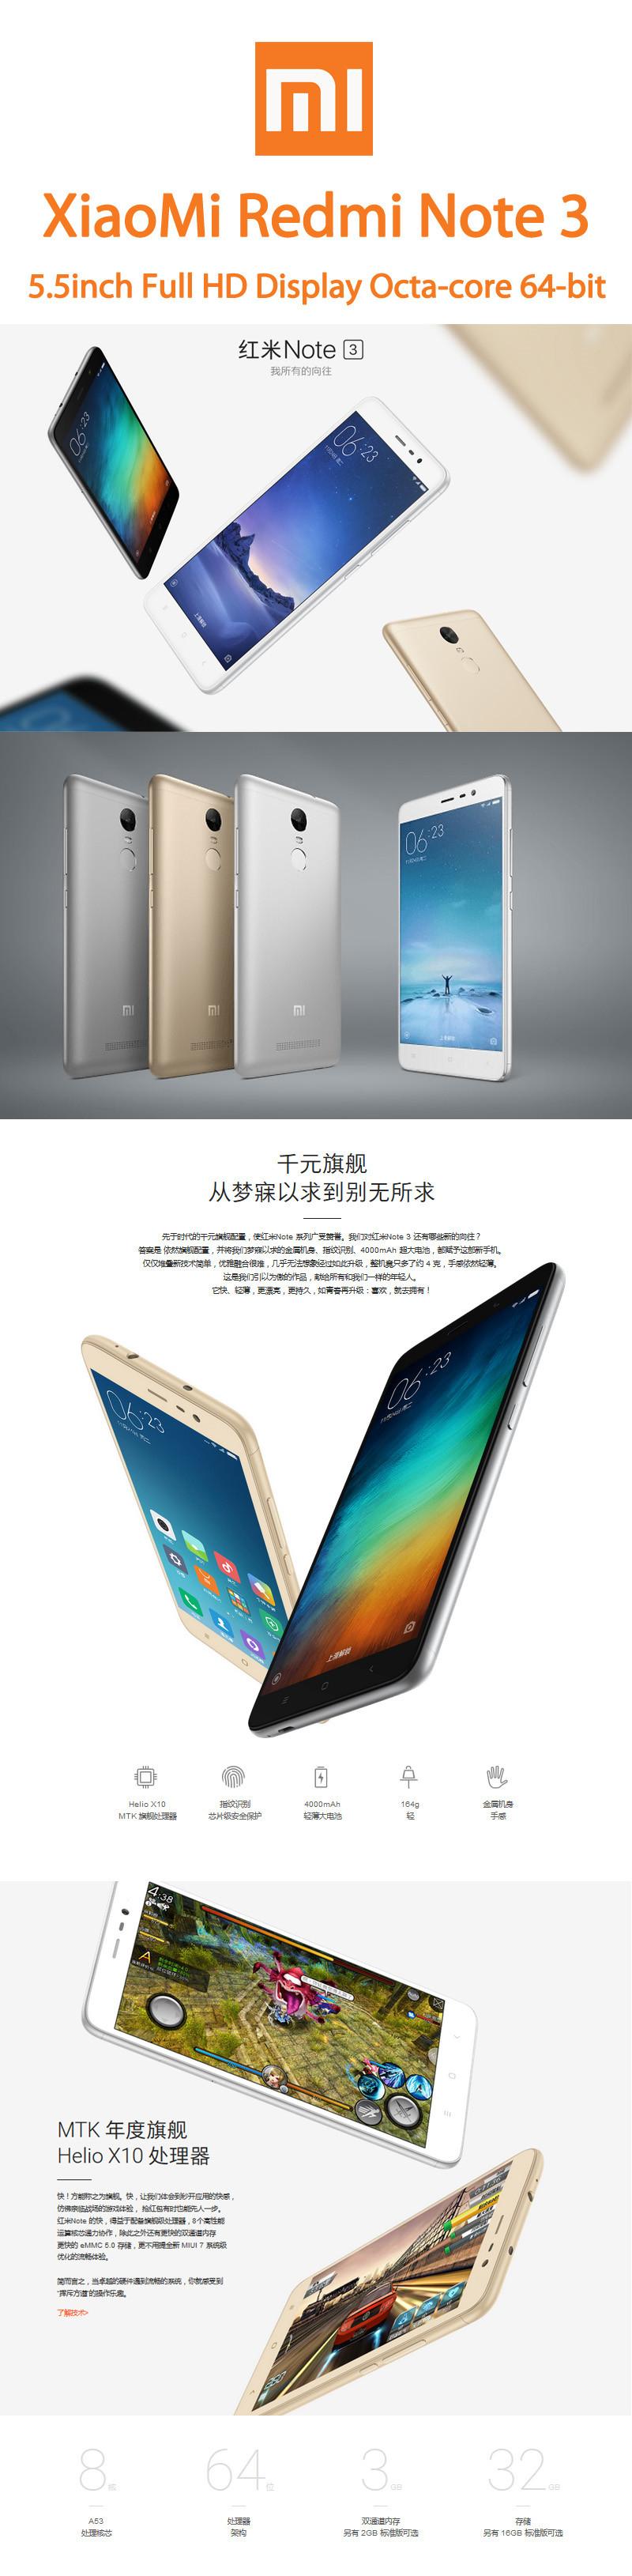 Buy Local Sellerlatest Xiaomi Redmi Note 3 55inch Full Hd Display Ram 2gb 16gb 4g Lte Helio X10 Octa Core Highlights